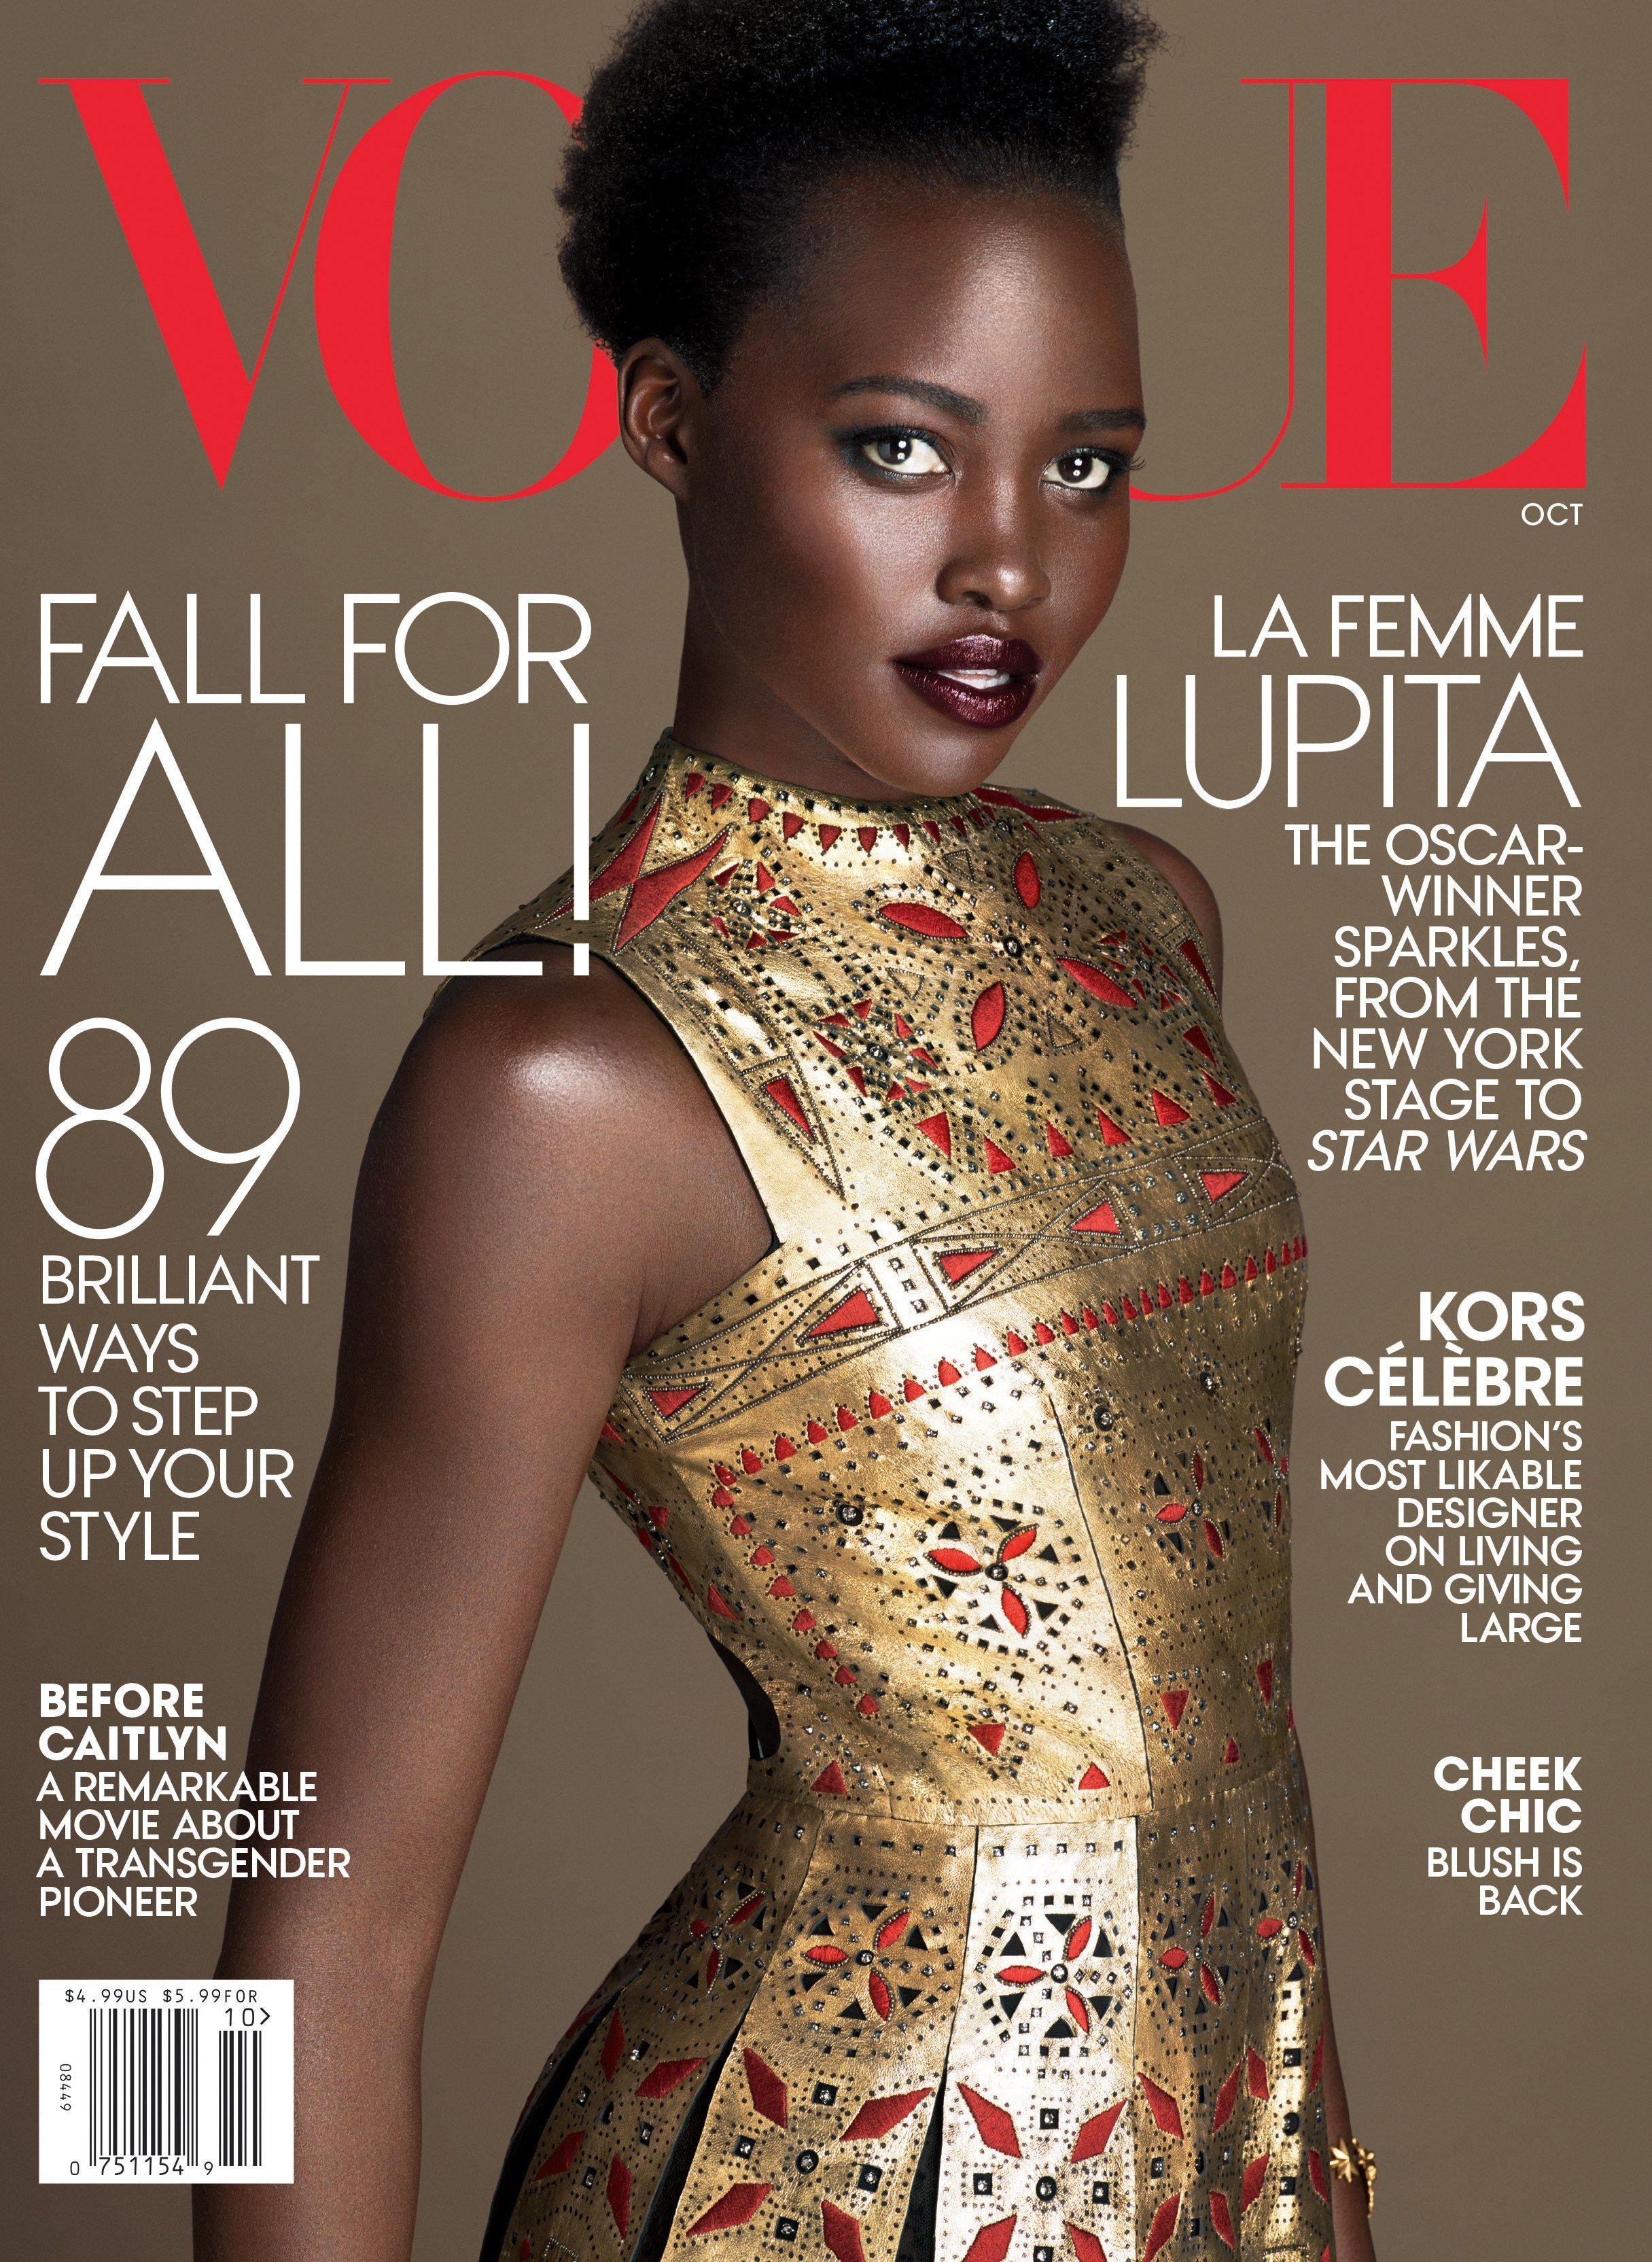 Miranda strap kerrs daring look yet, Dior christian haute couture fall